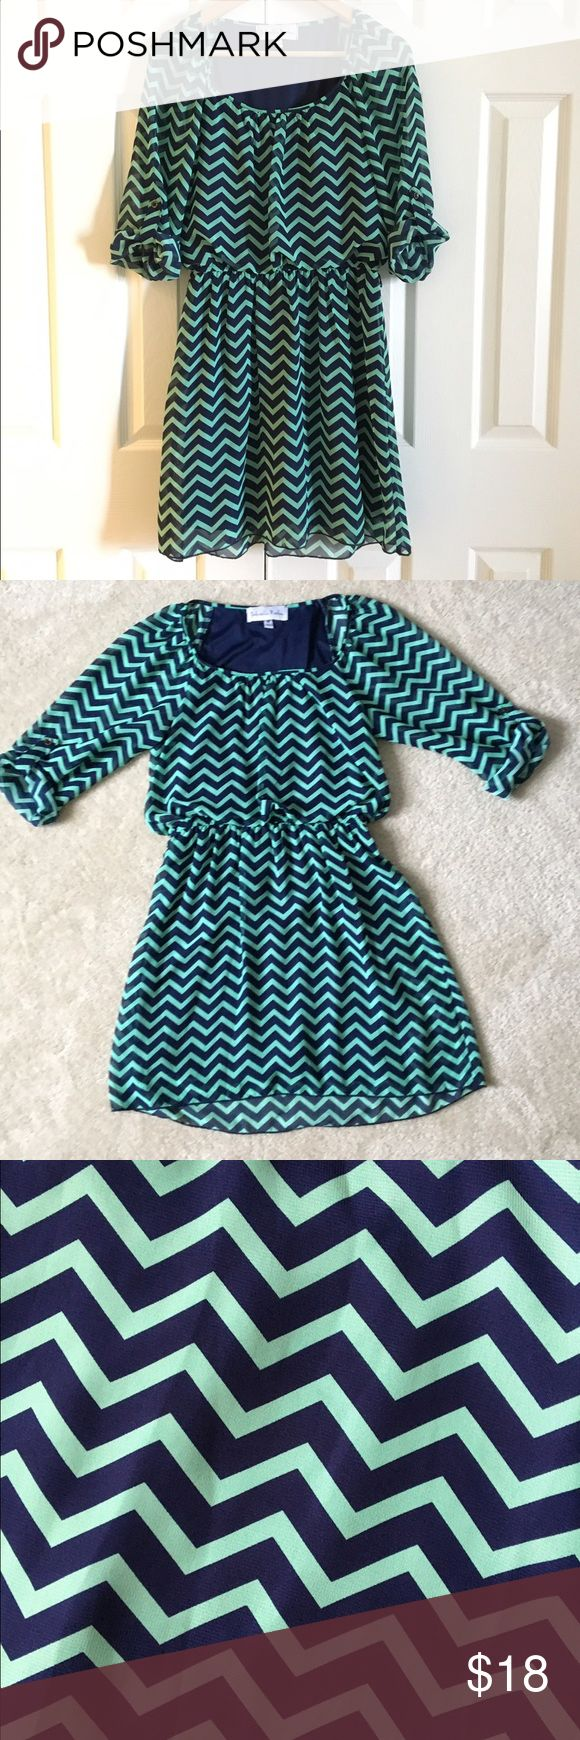 Gabriella Rocha green / blue chevron chiffon dress Gabriella Rocha blue and green chevron chiffon dress with 3/4 sleeves in great condition. Knee length, fits M size 6-10 Gabriella Rocha Dresses Long Sleeve